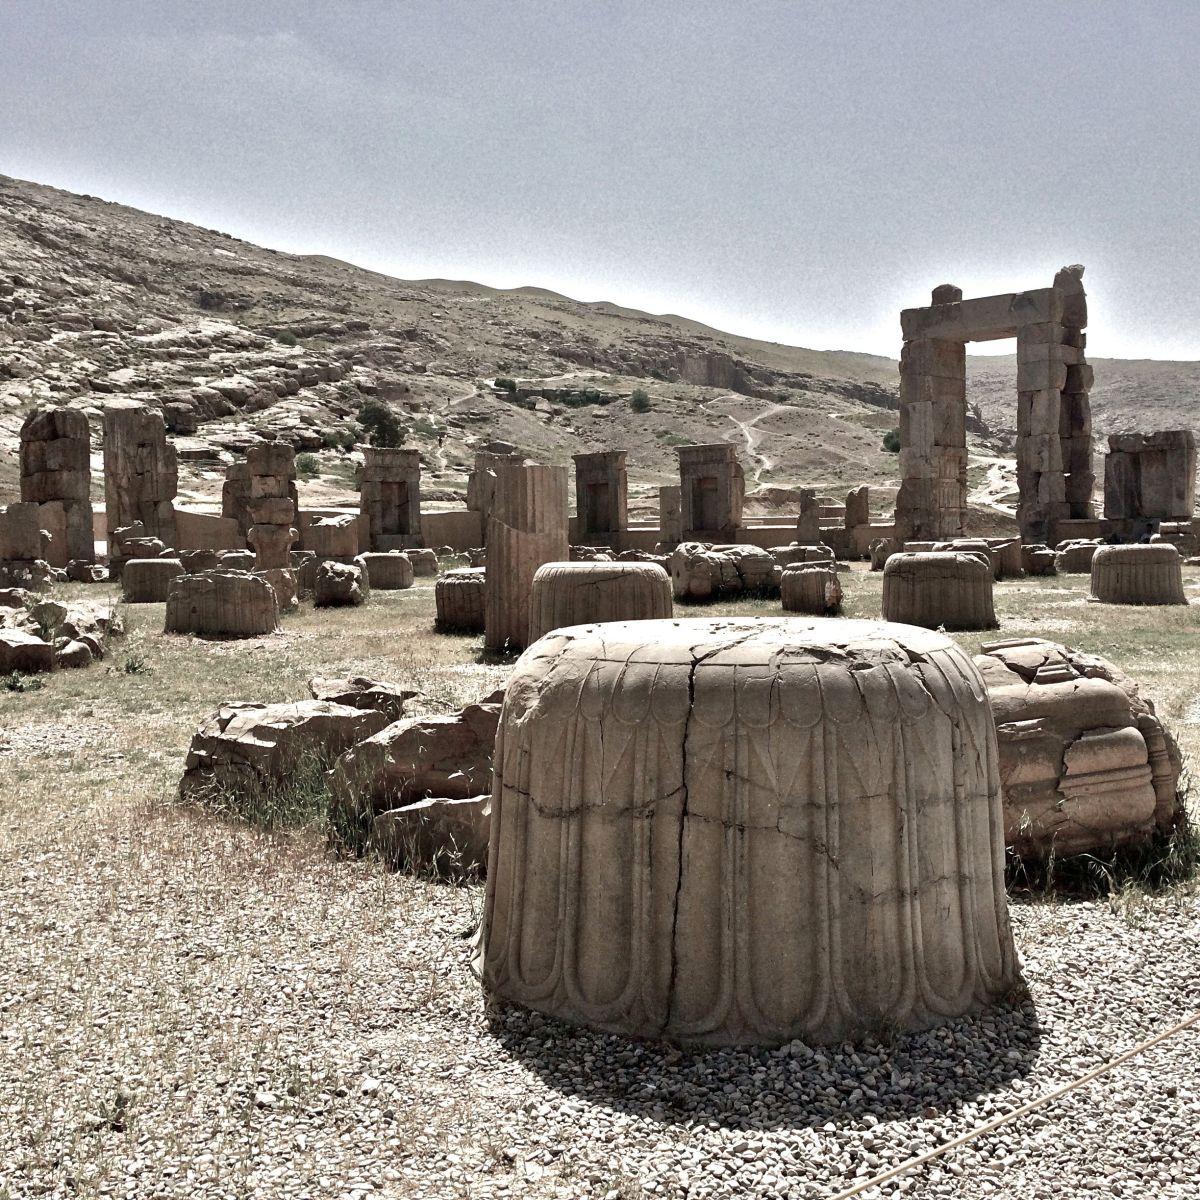 Persepolis, a Greek name